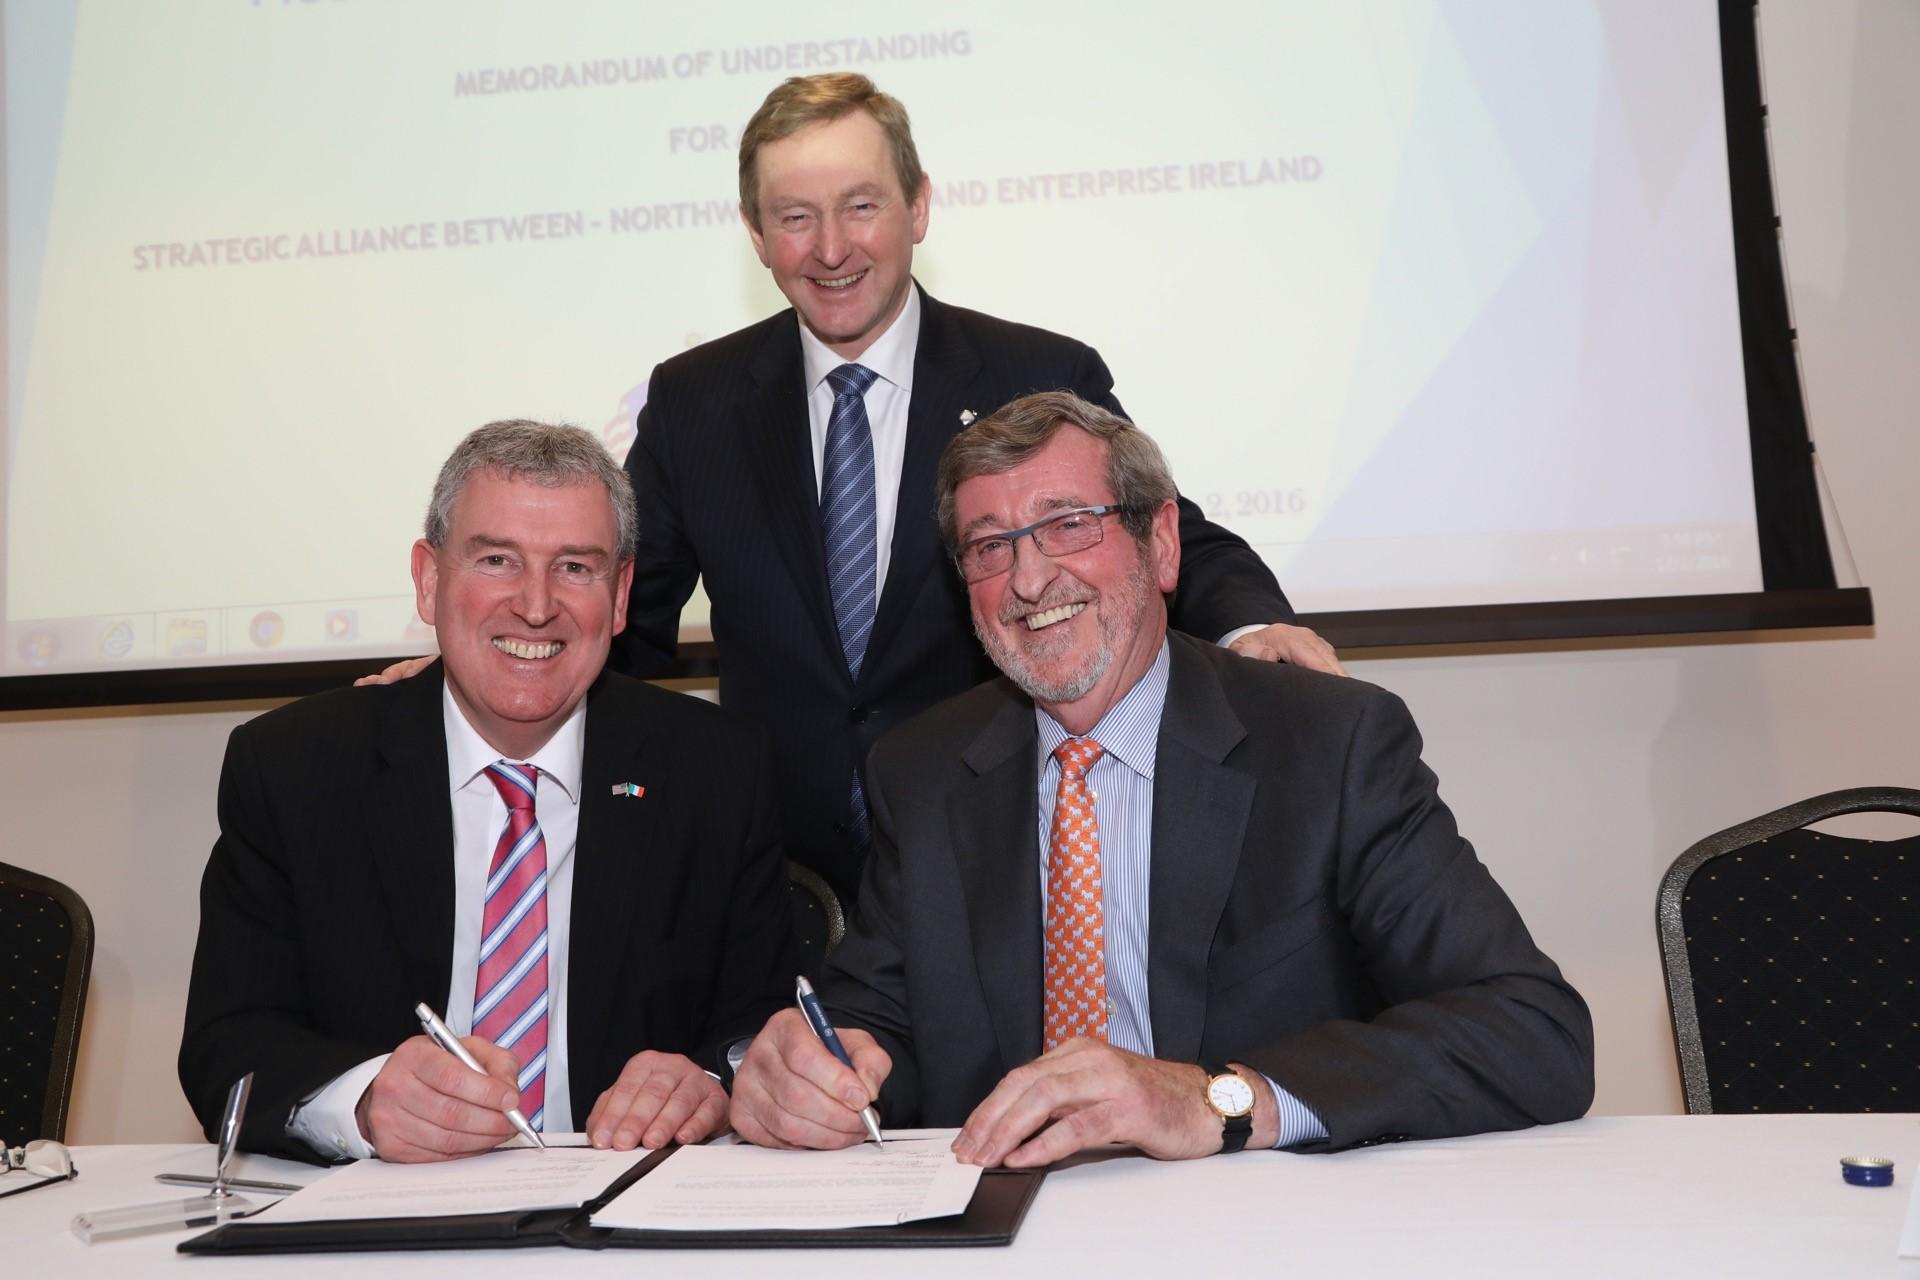 An Taoiseach welcomes strategic partnership agreement between – Partnership Agreement Between Two Companies